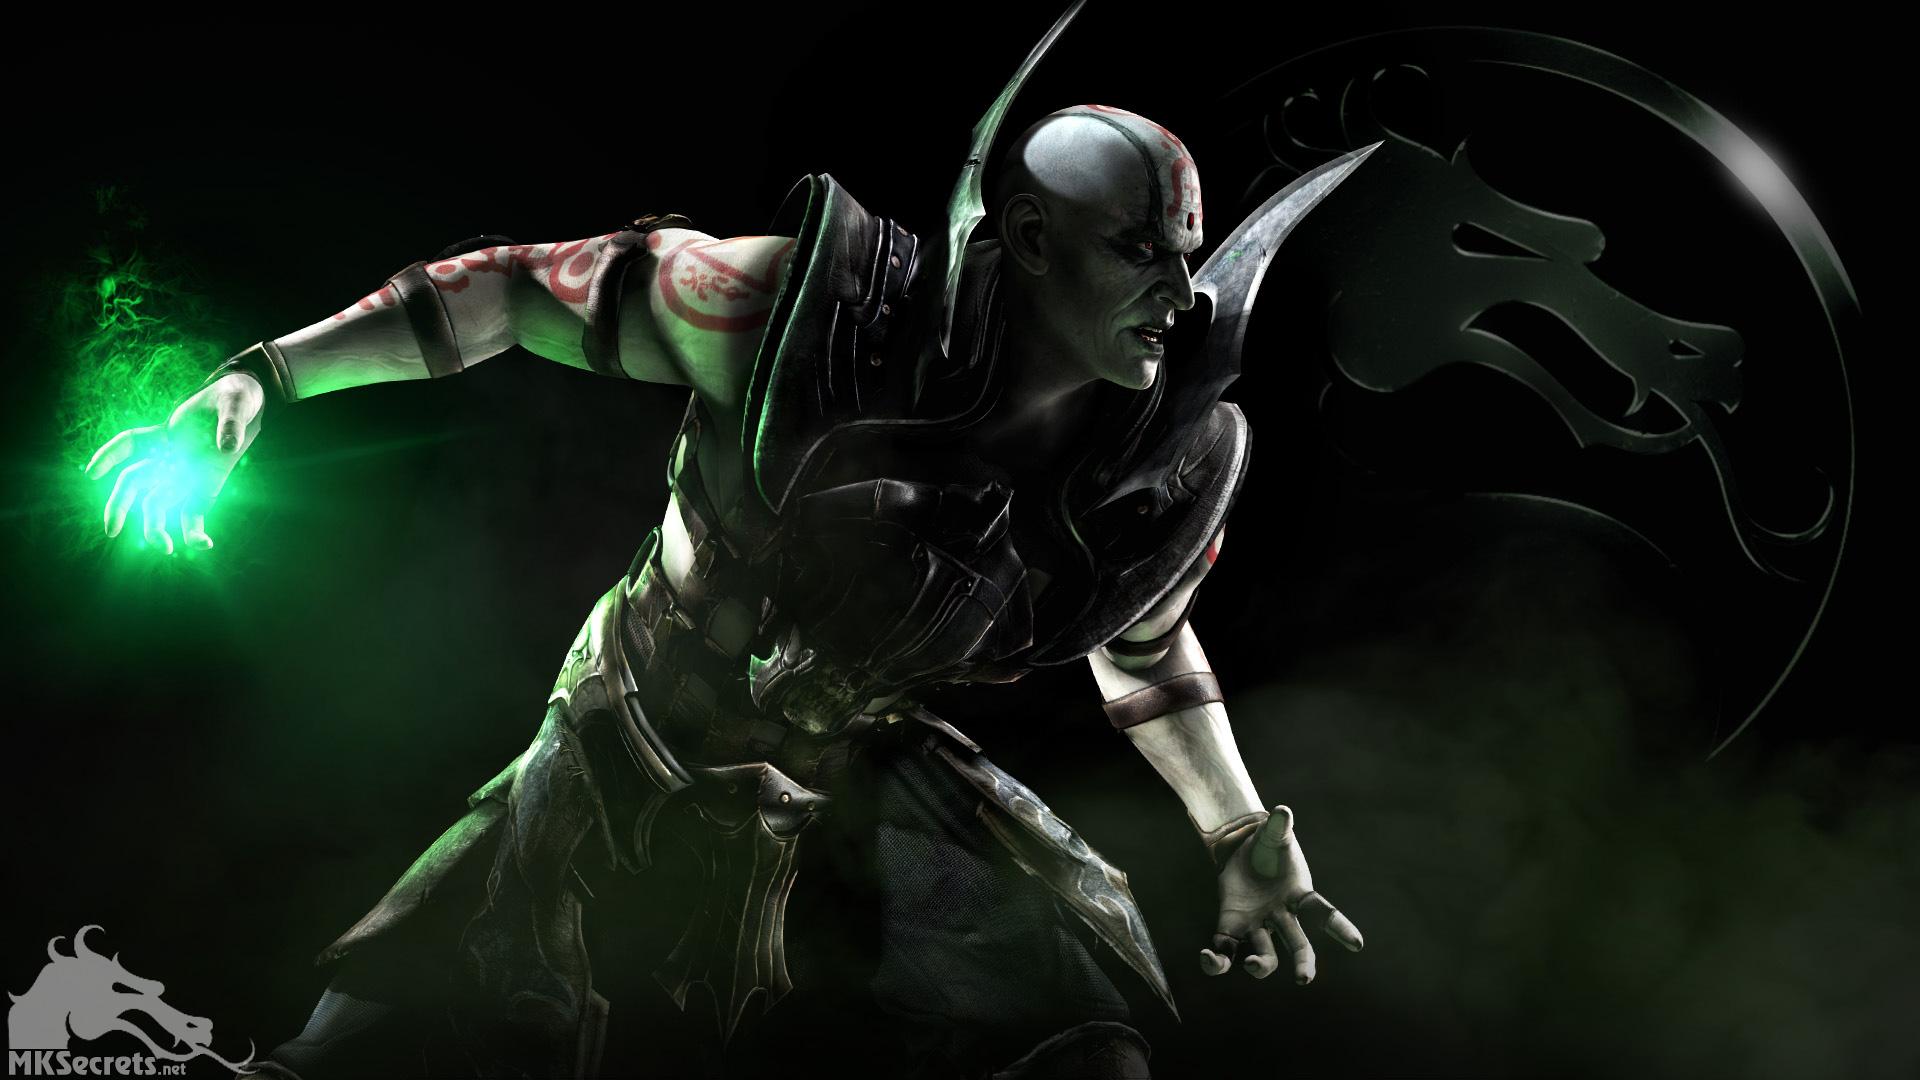 Mortal Kombat X Renders   Mortal Kombat Secrets 1920x1080